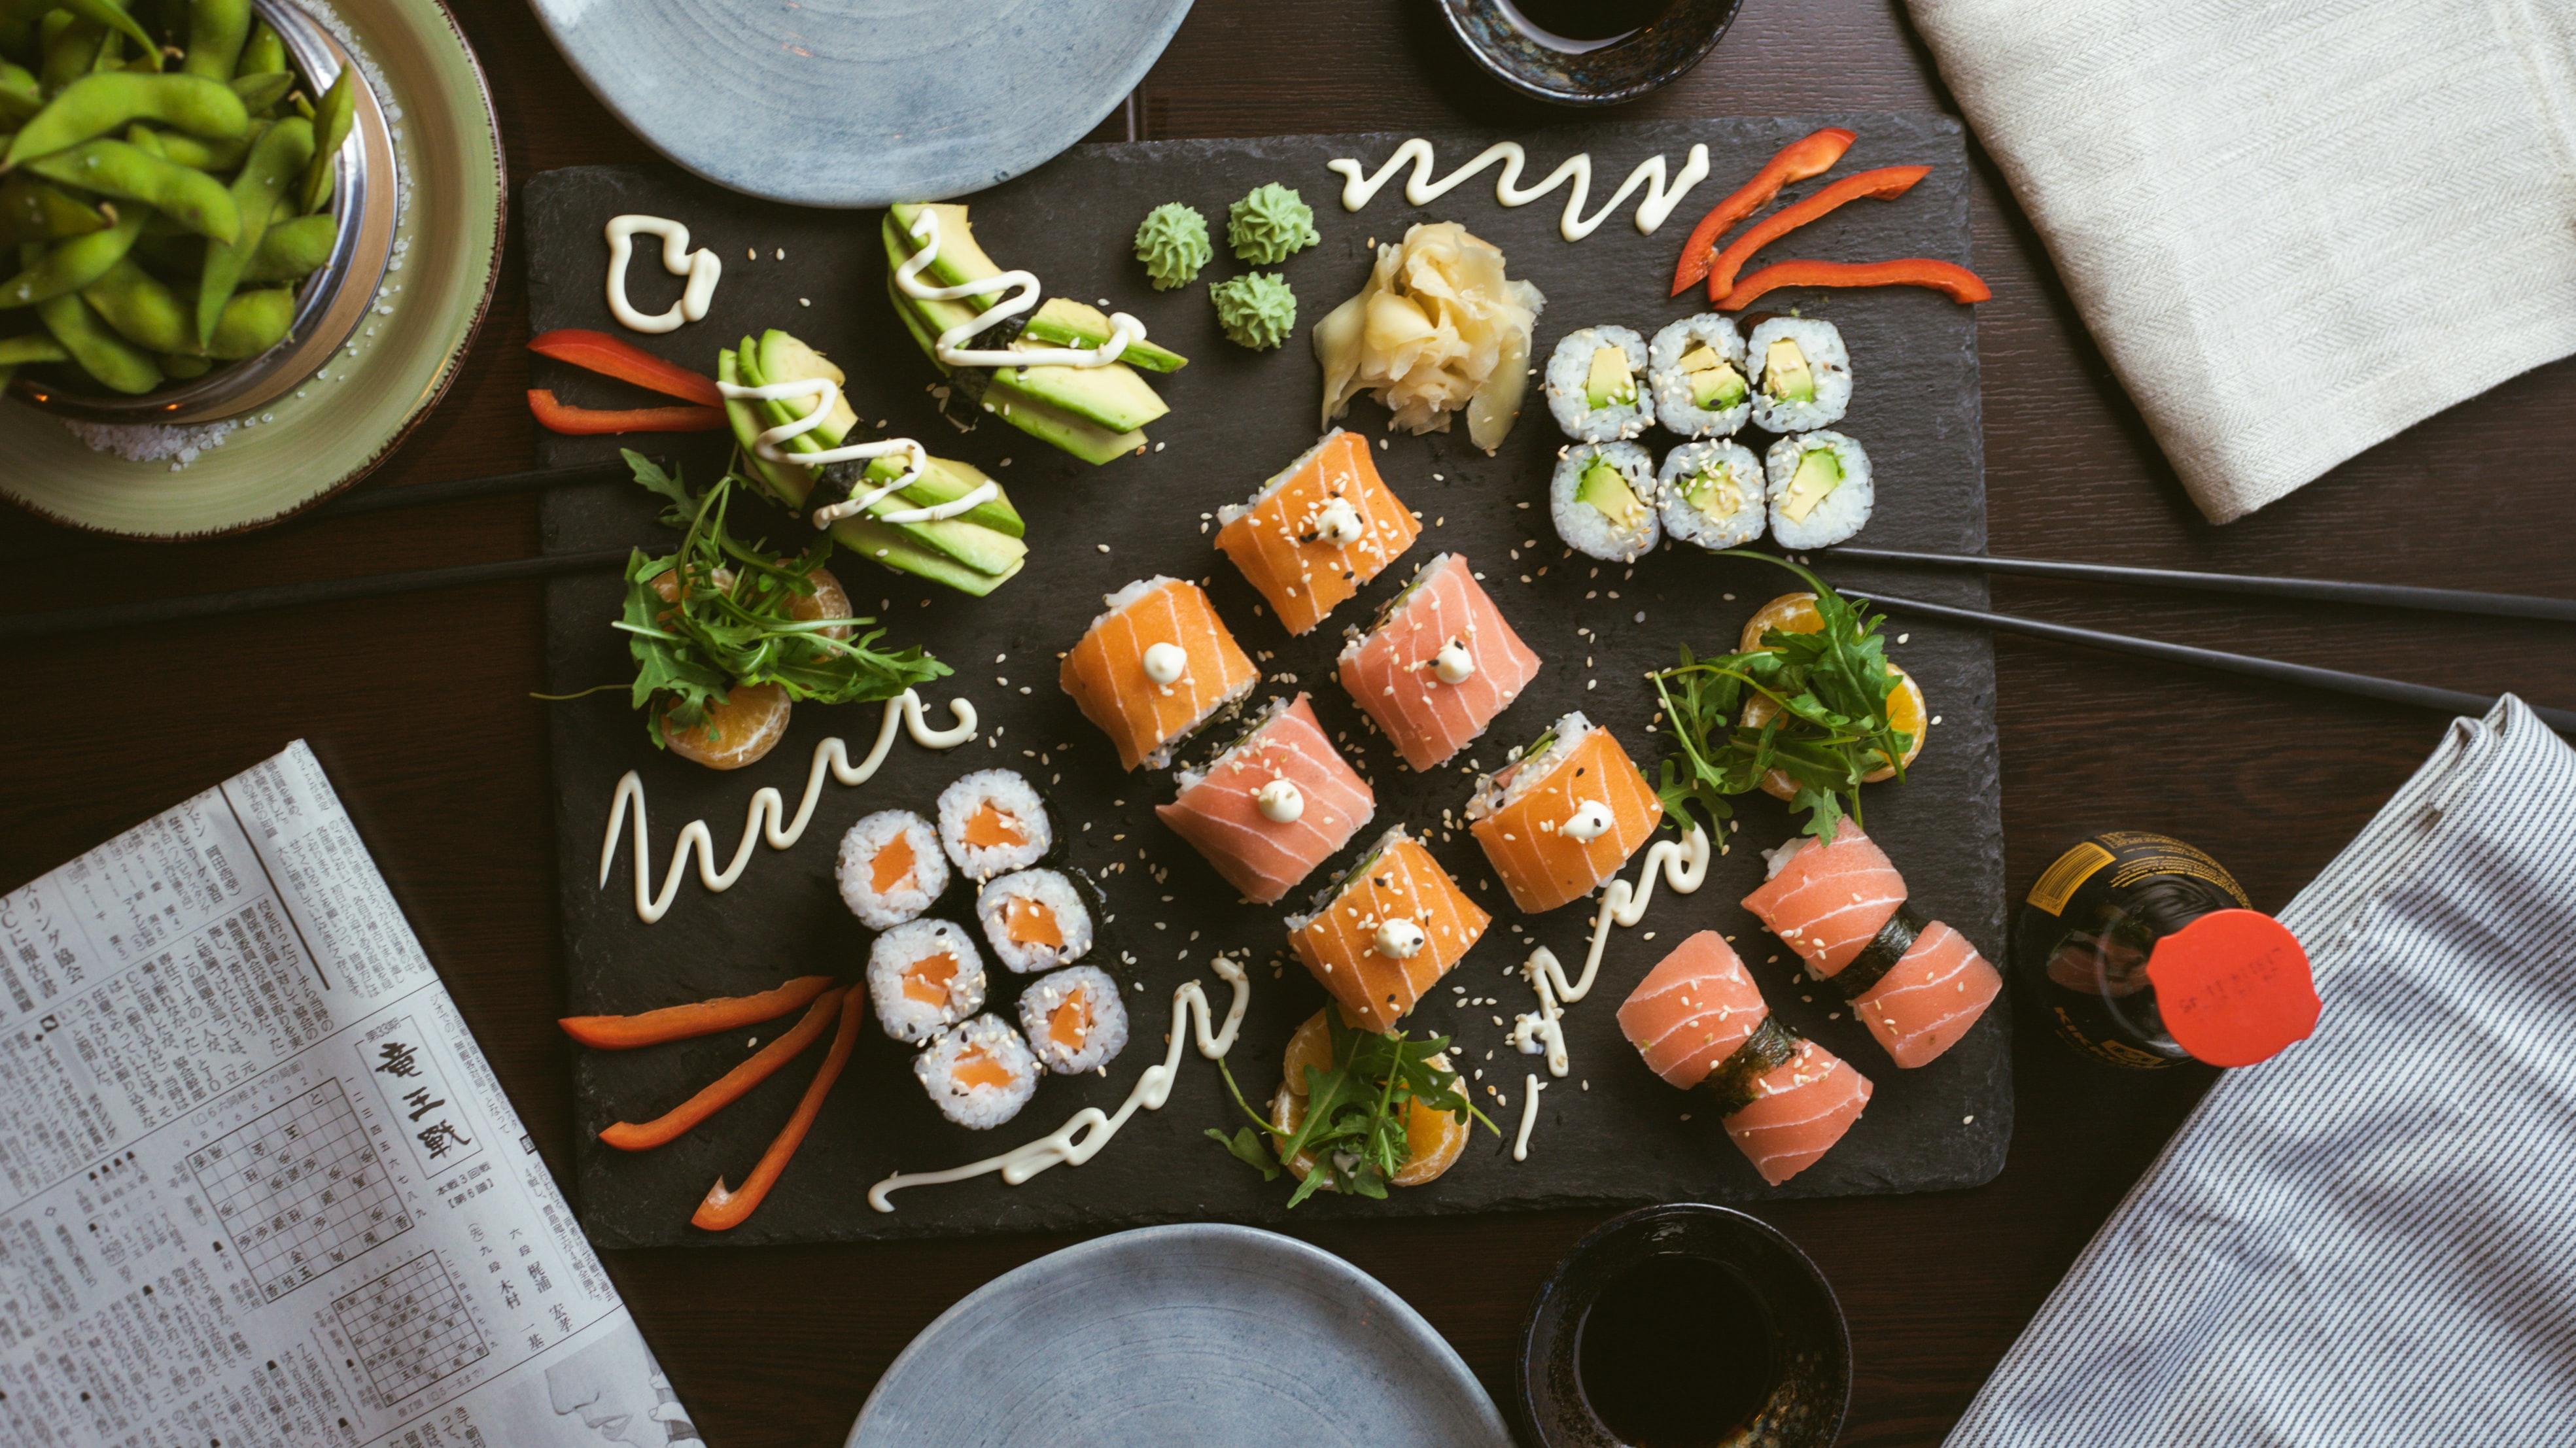 Koopr-sushis-jakub-dziubak-unsplash